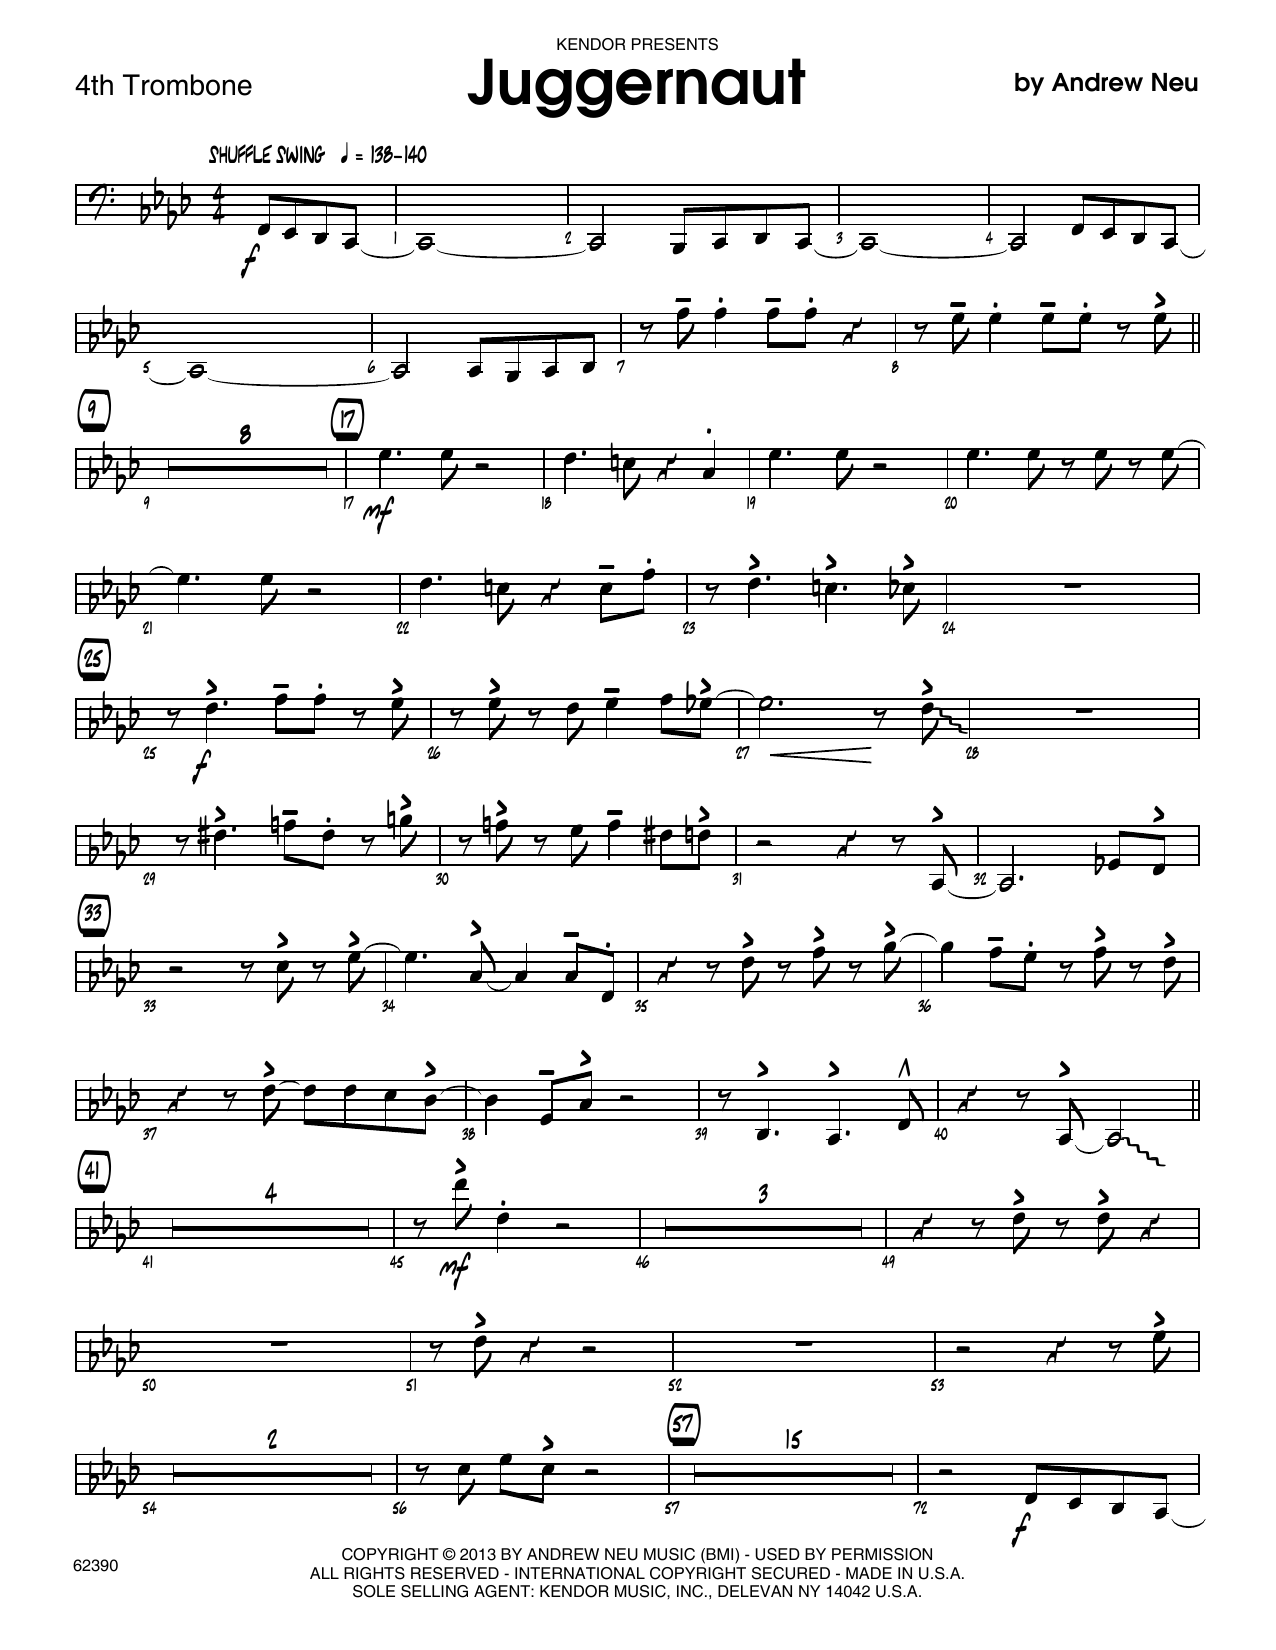 Juggernaut - 4th Trombone Sheet Music